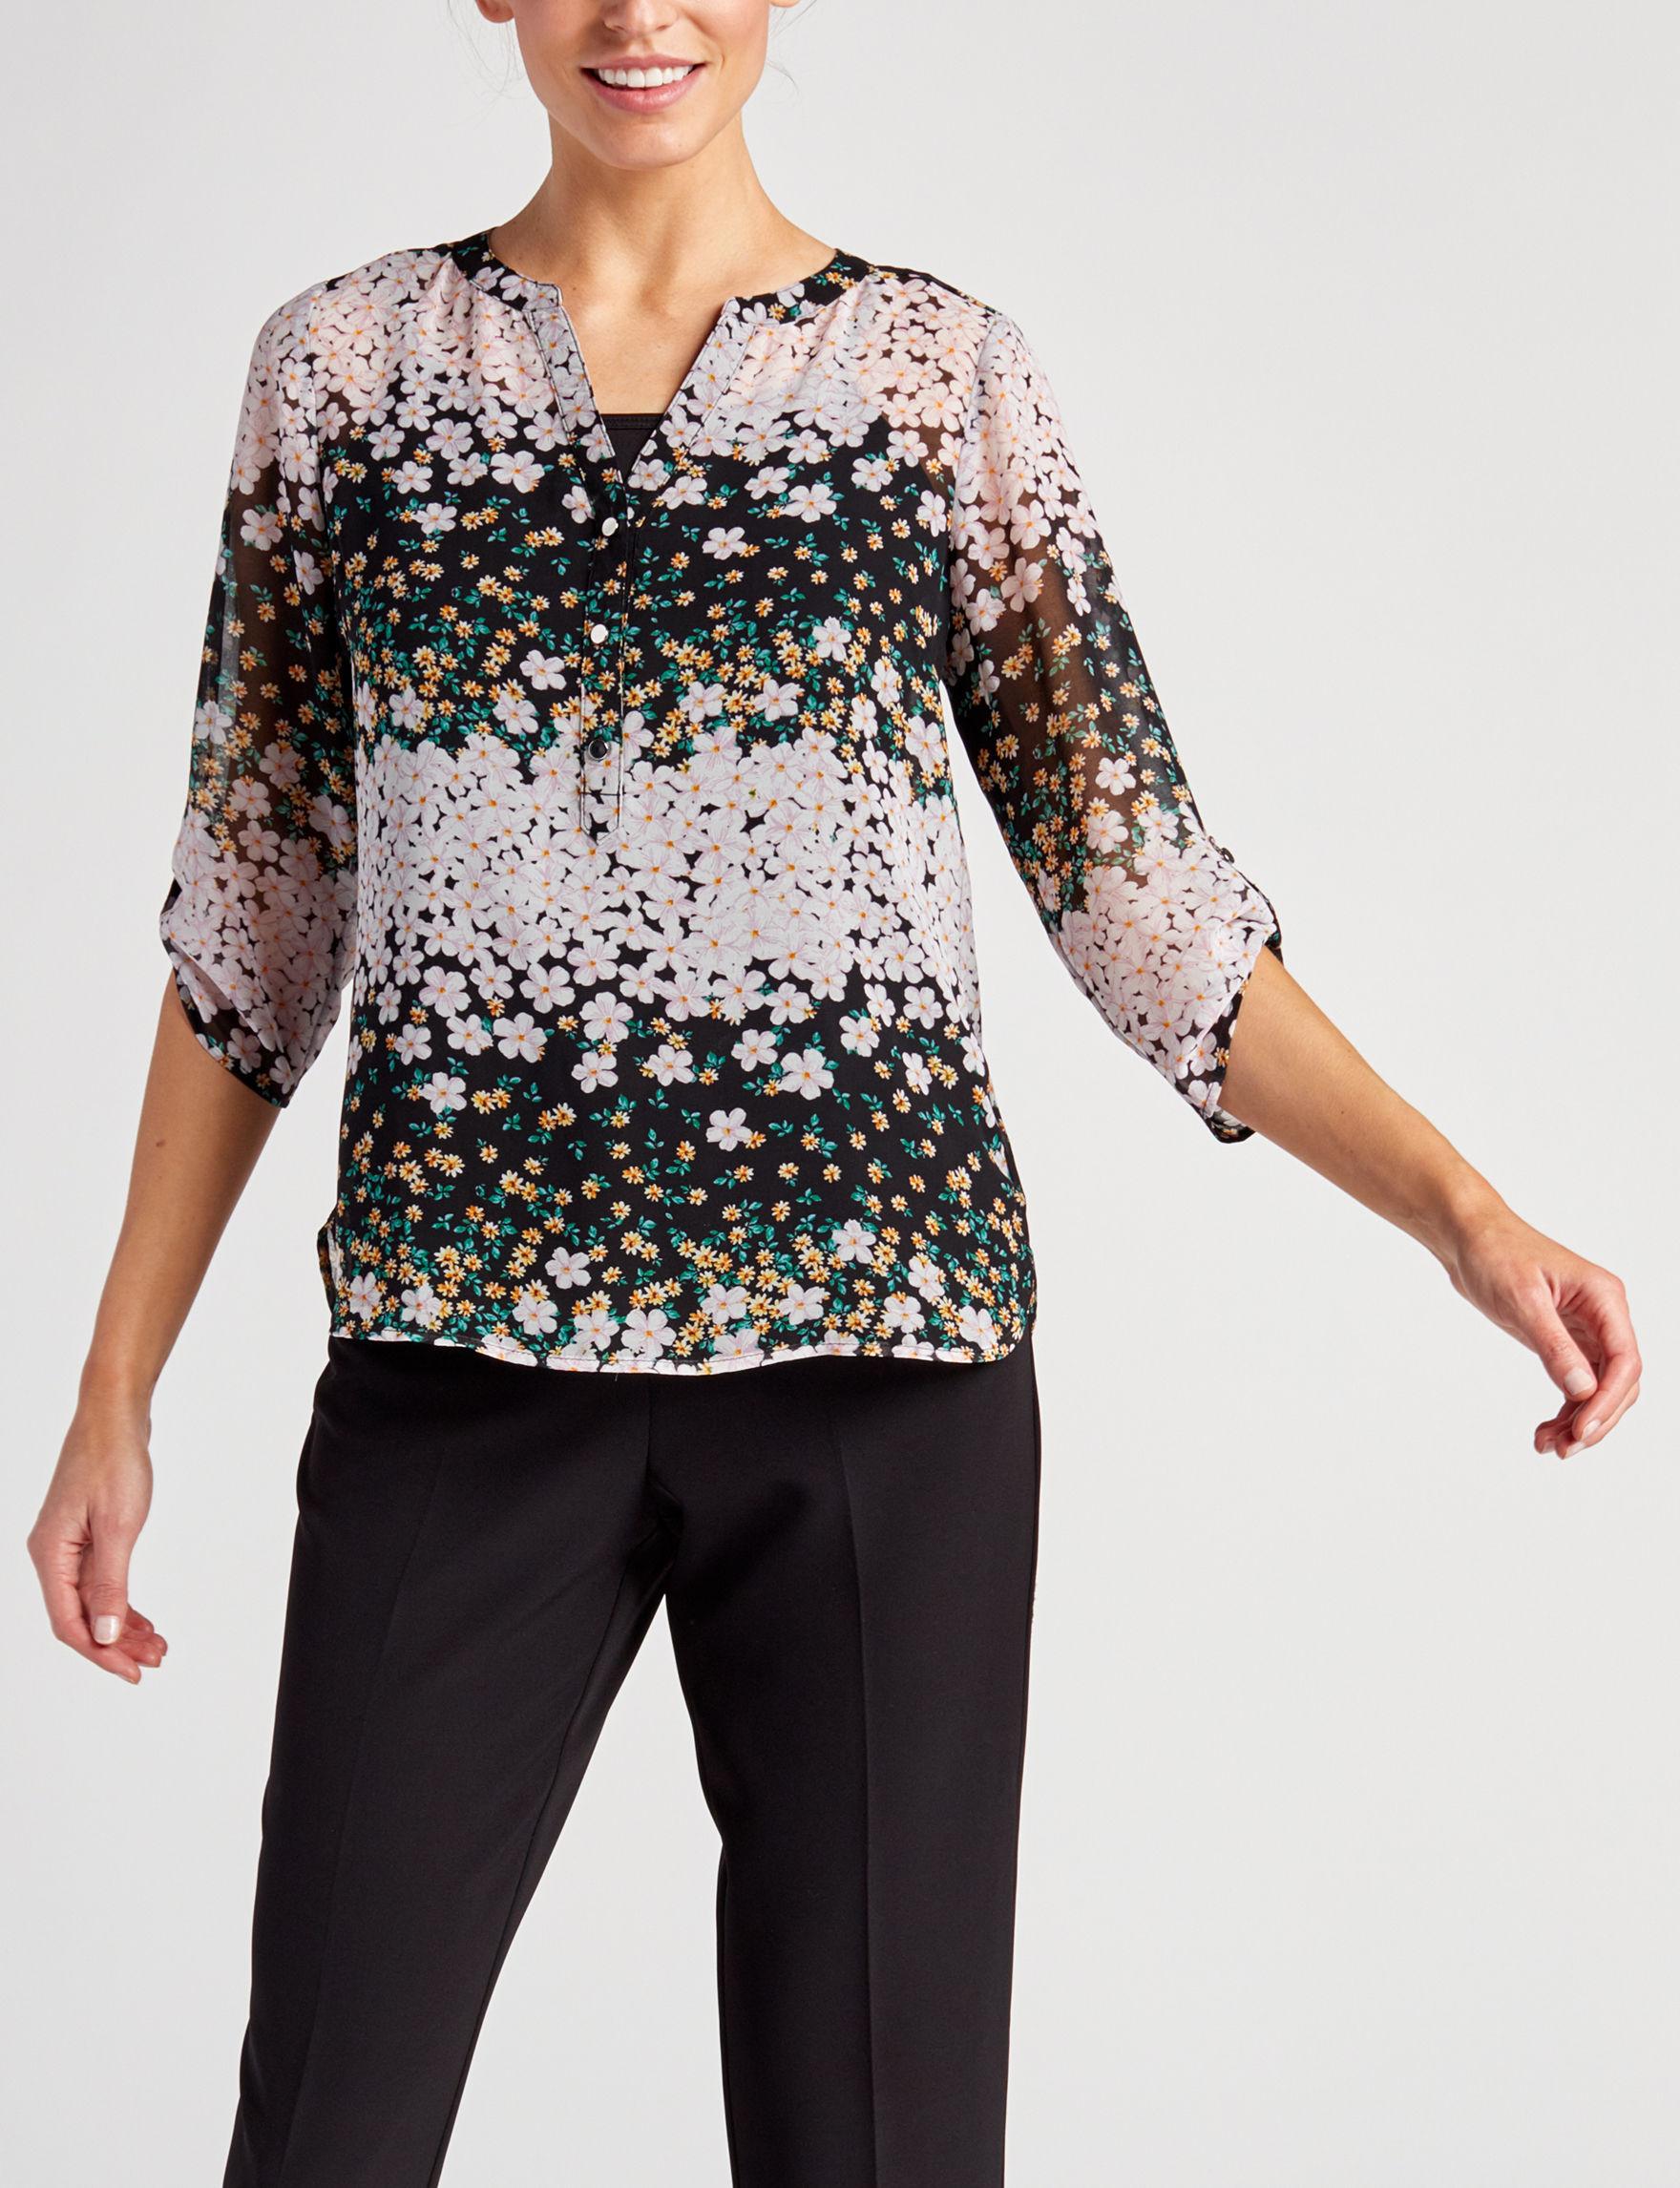 Sara Michelle Black Floral Shirts & Blouses